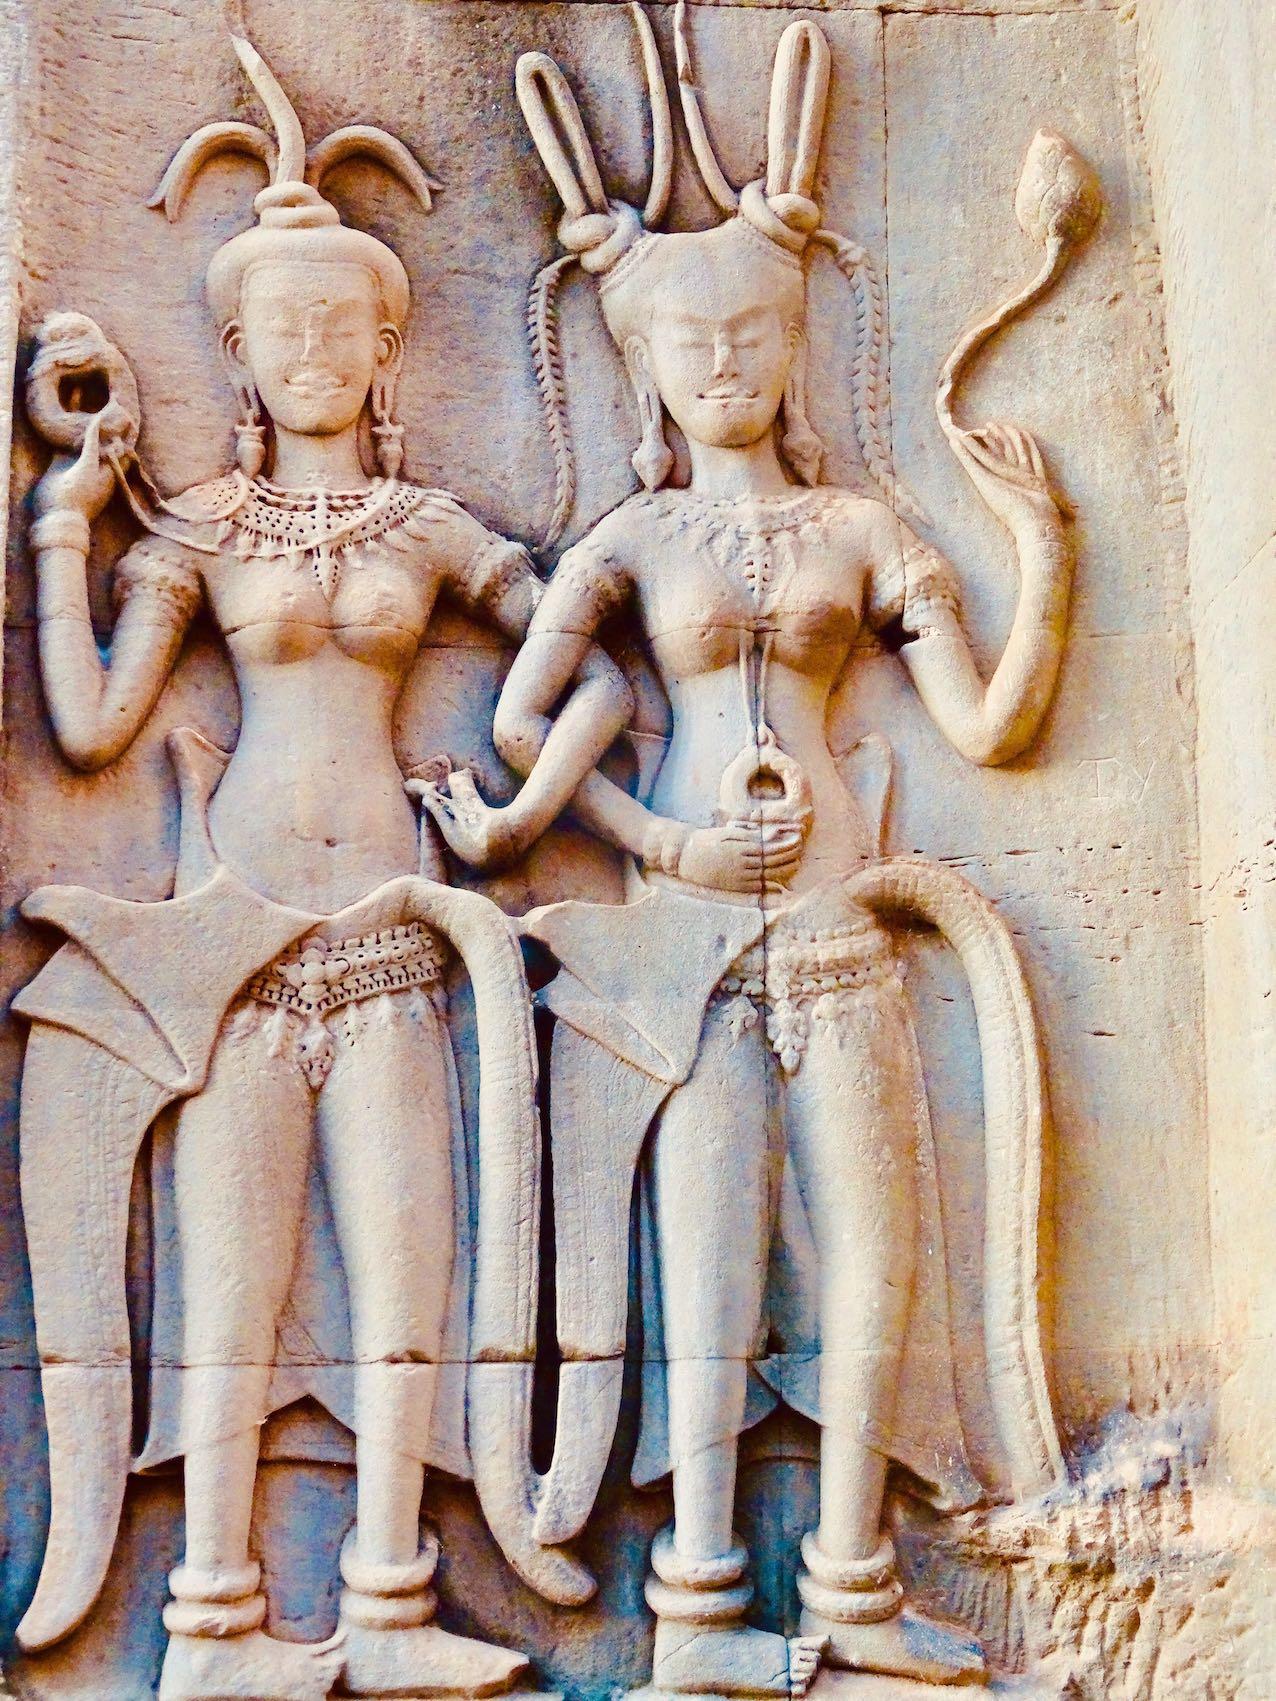 Buddhist sculptures at Angkor Wat